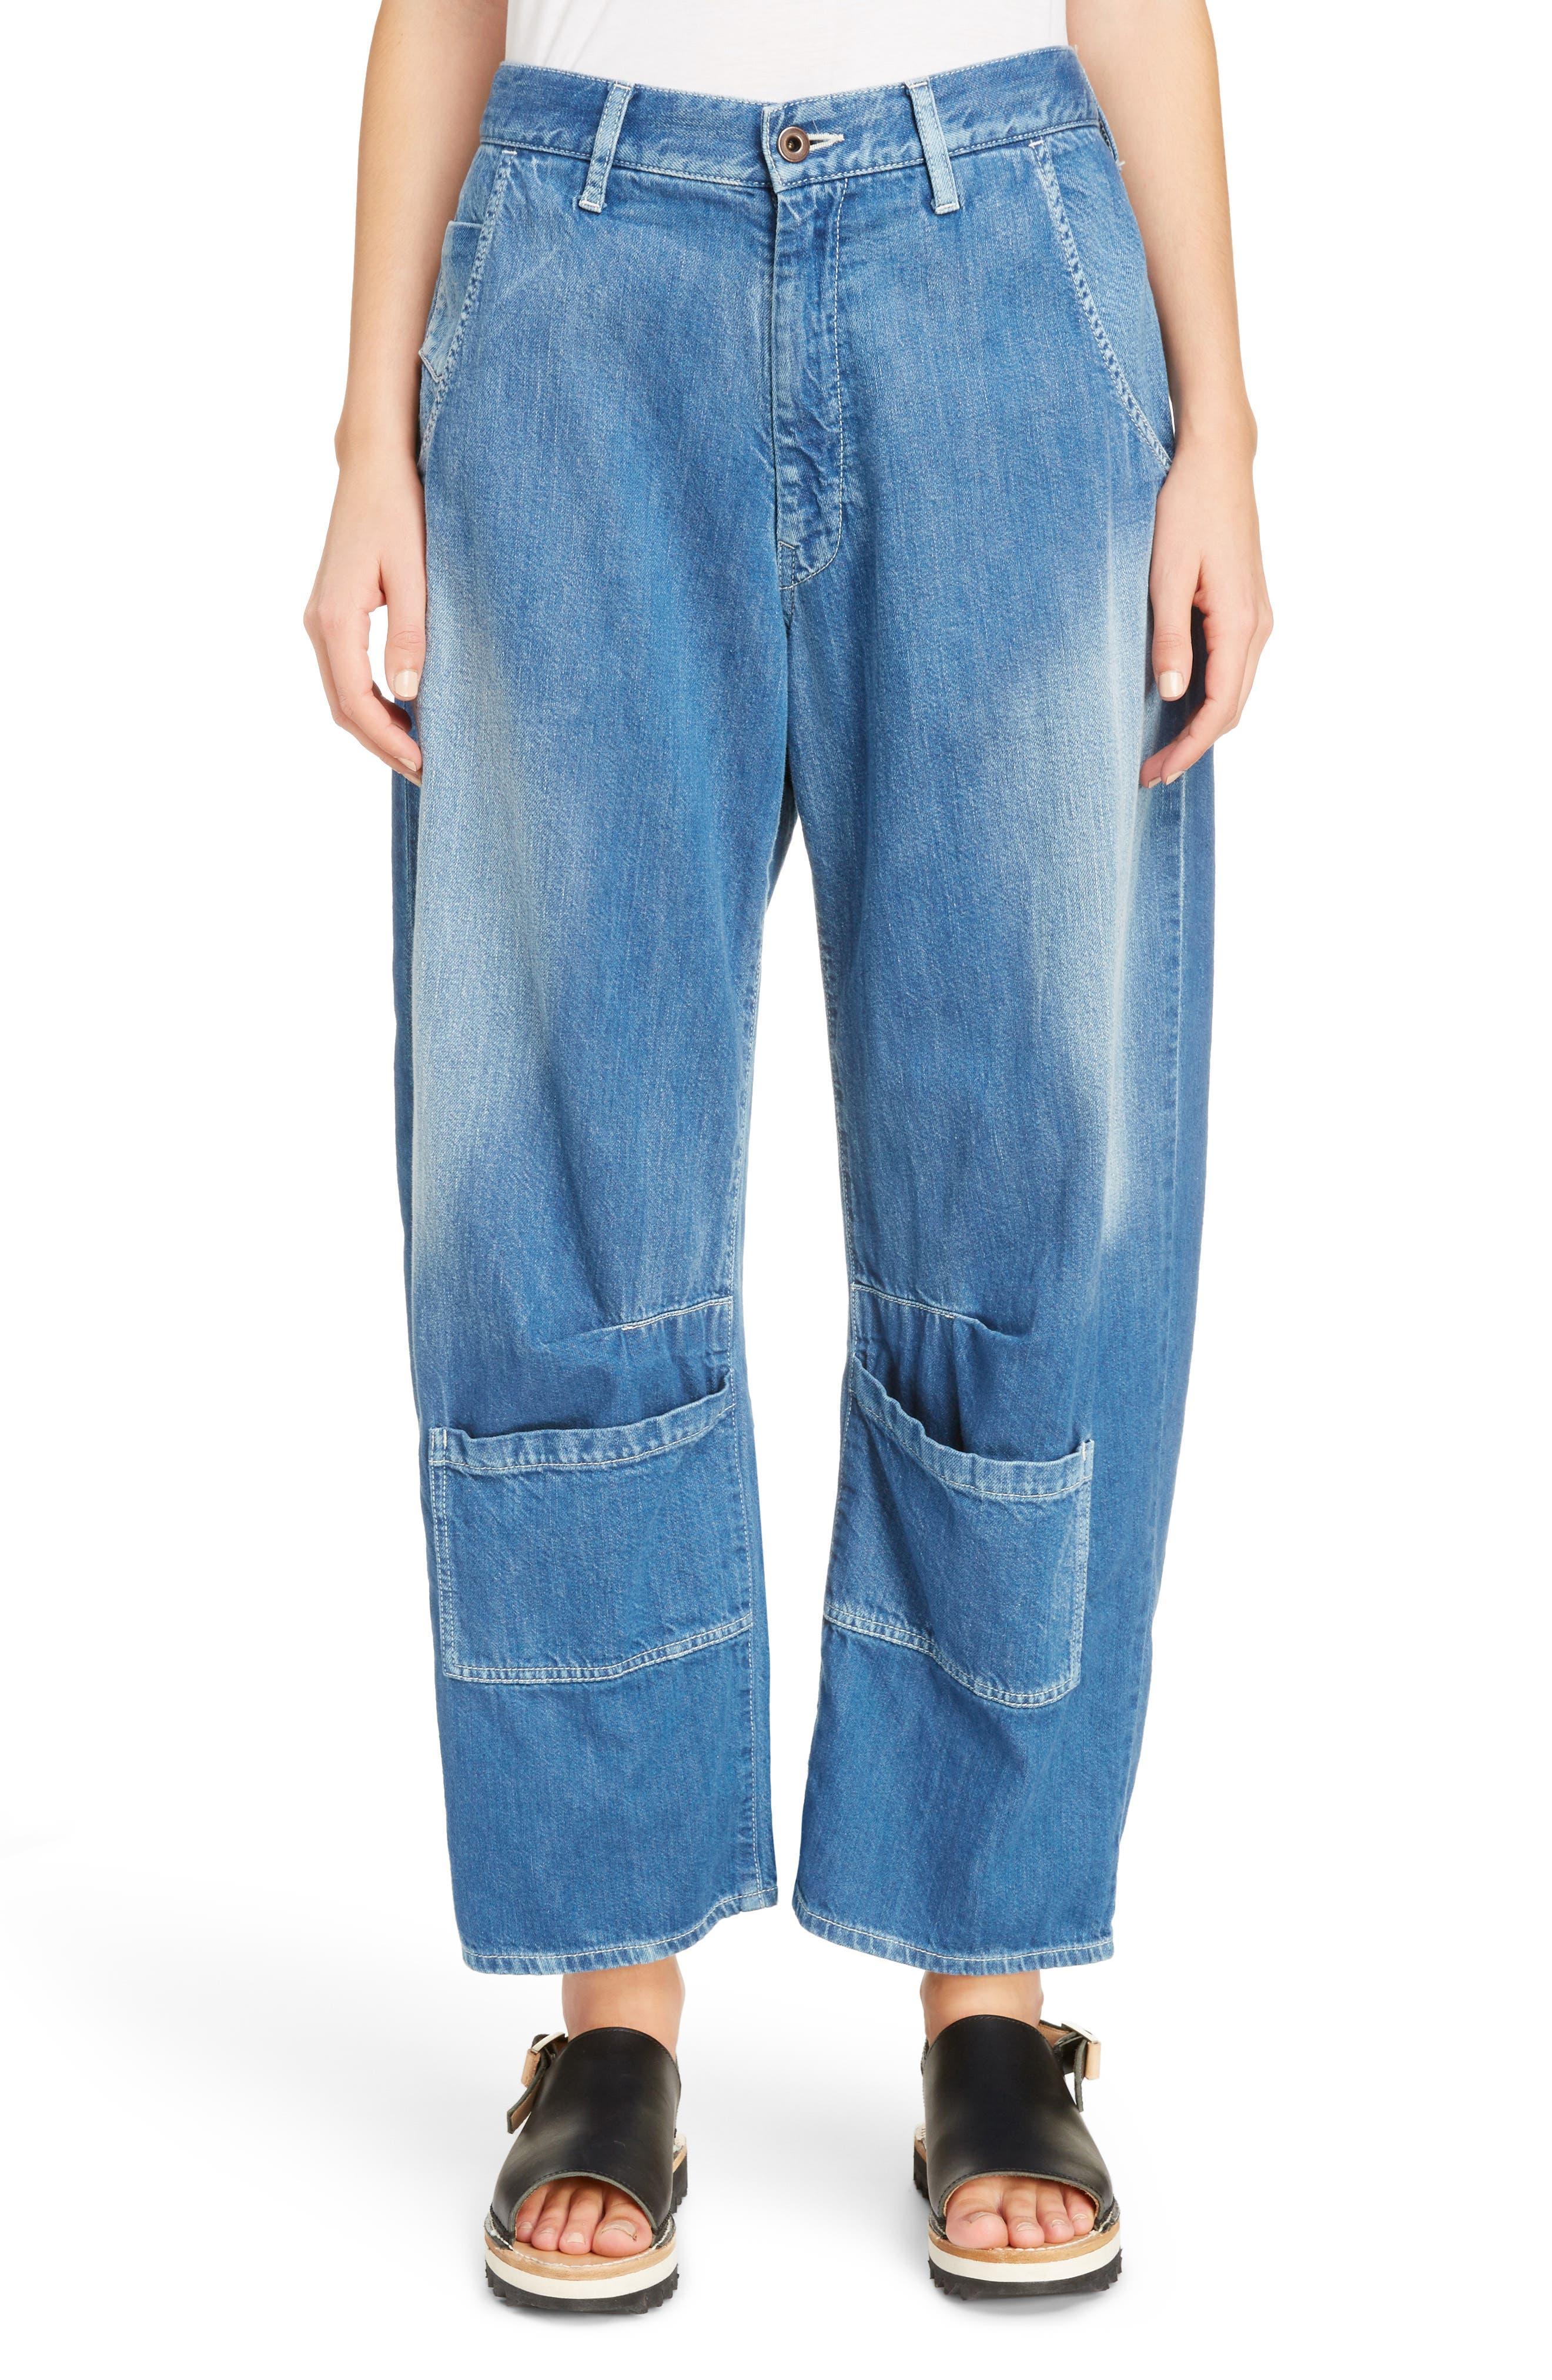 Y's by Yohji Yamamoto Oversized Pocket Jeans